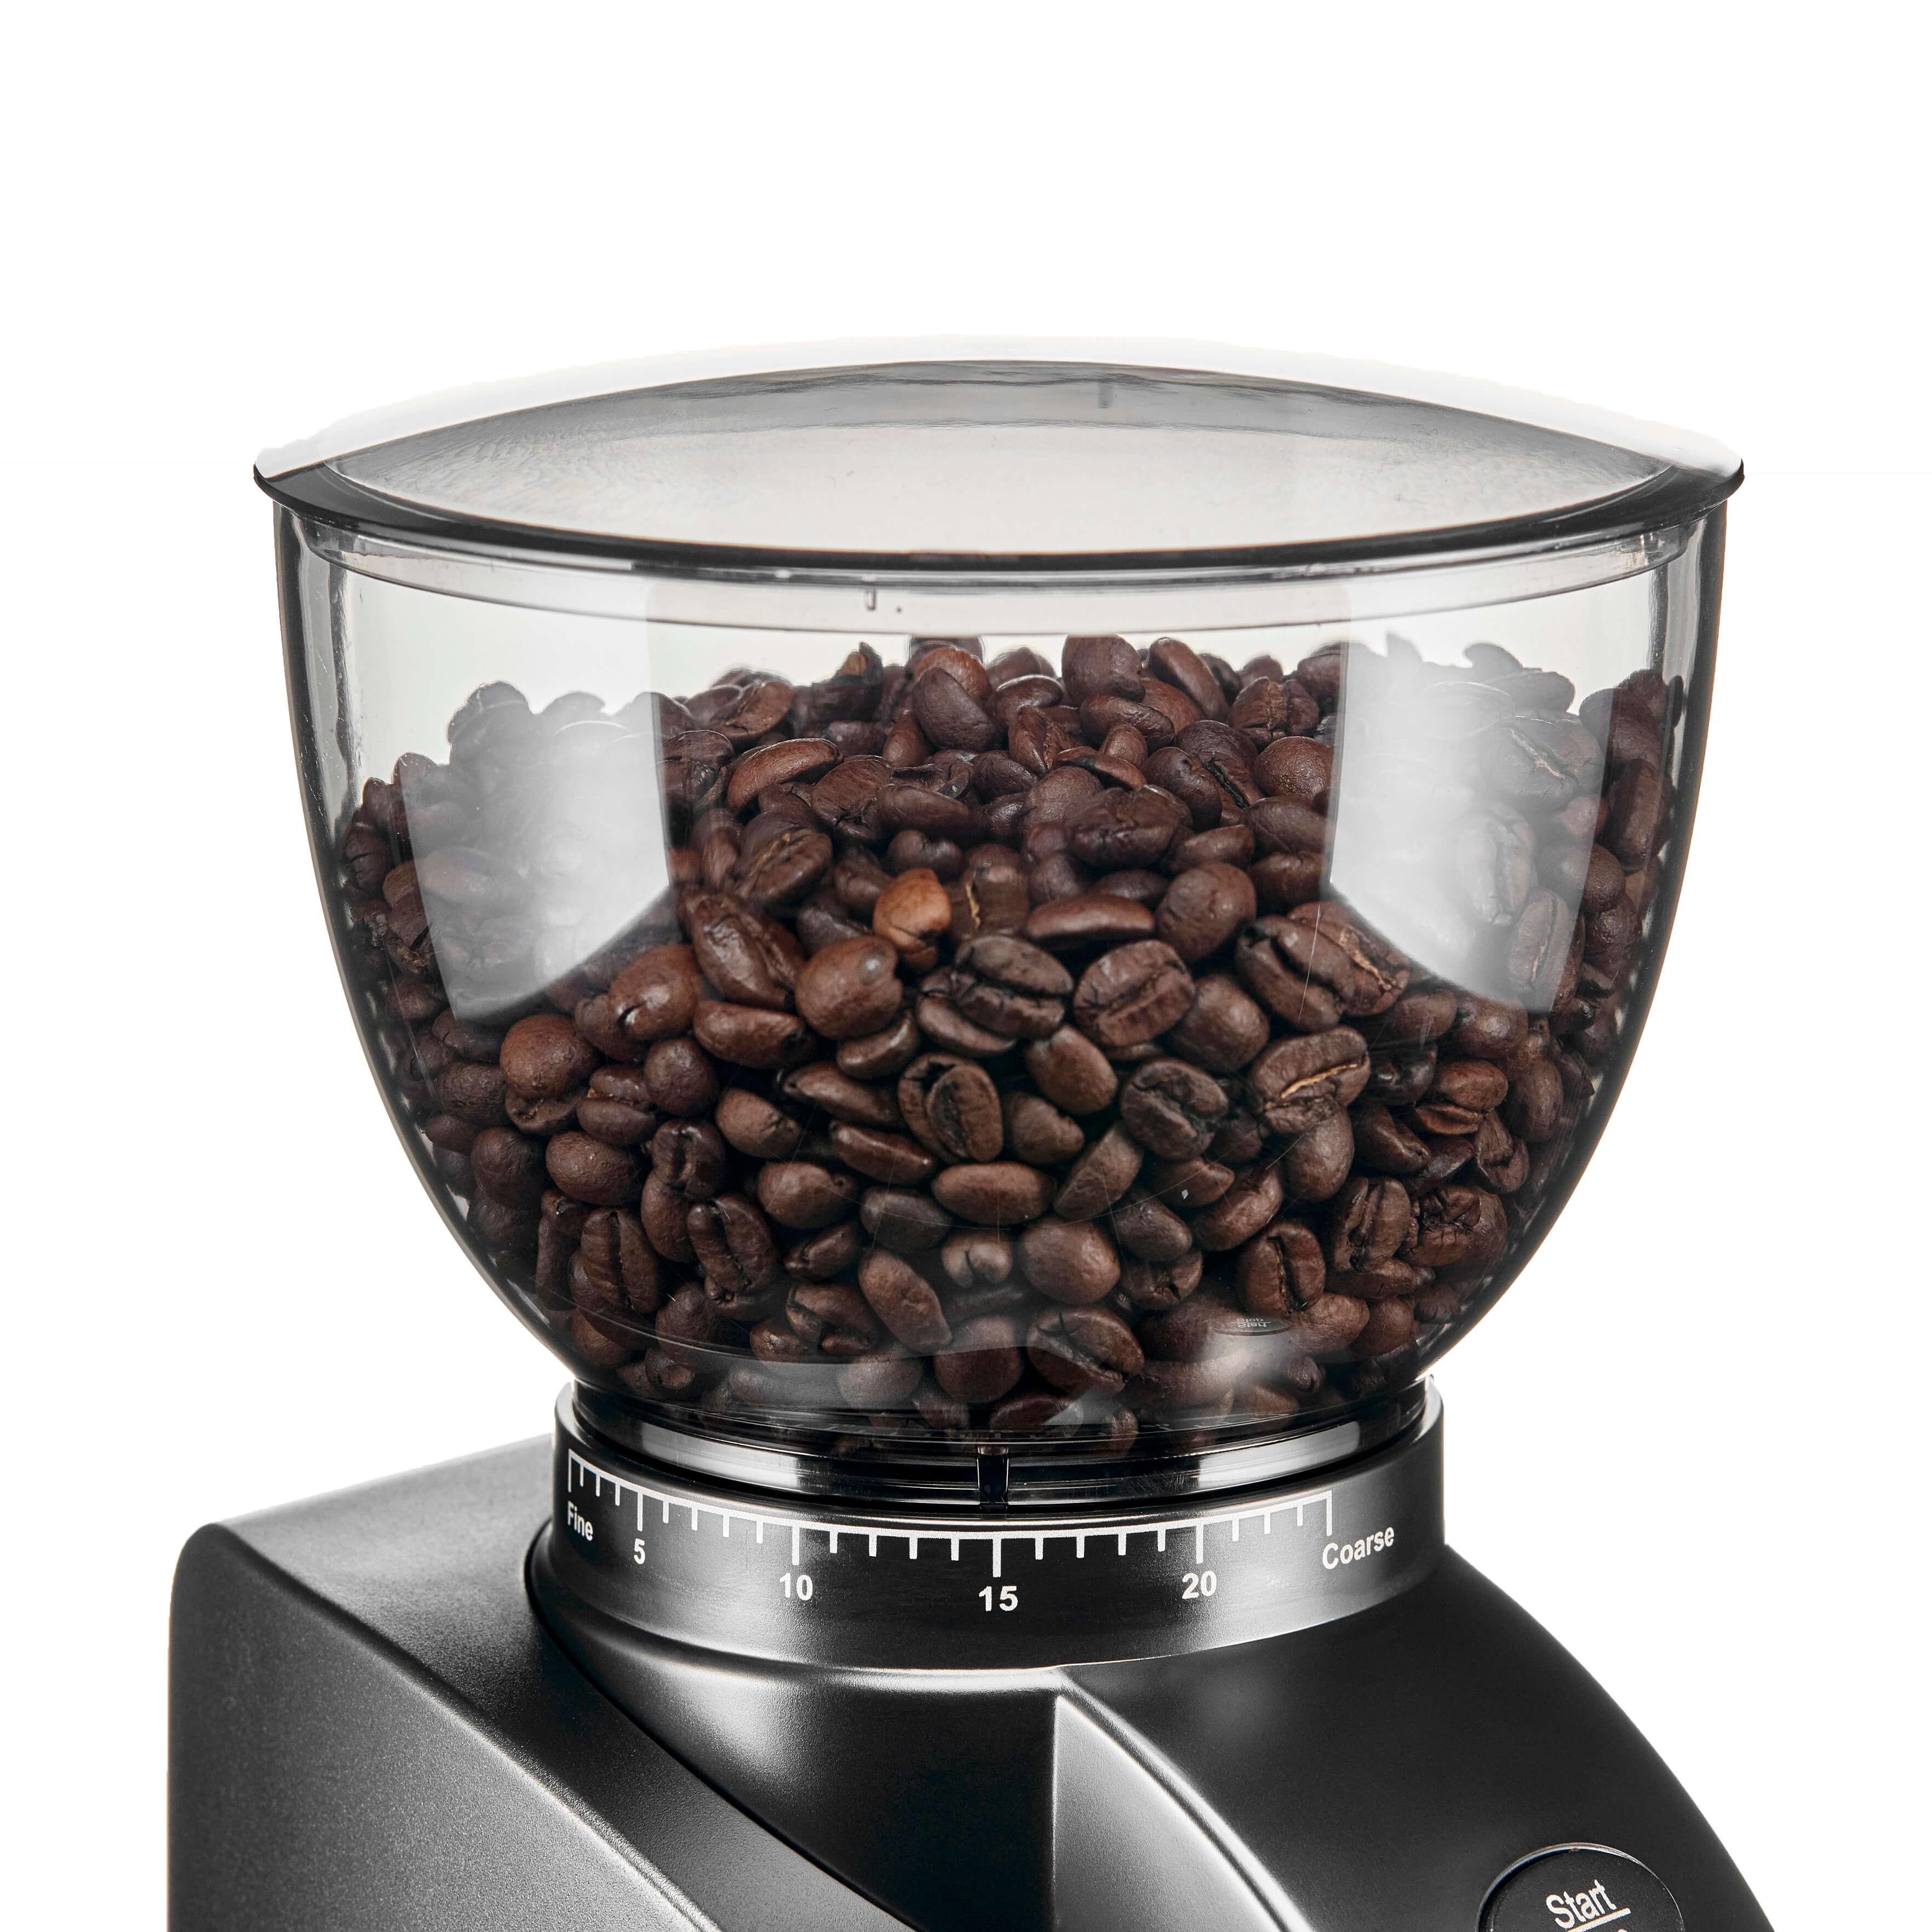 Solis Kaffeemühle Scala Zero Static Typ 1661